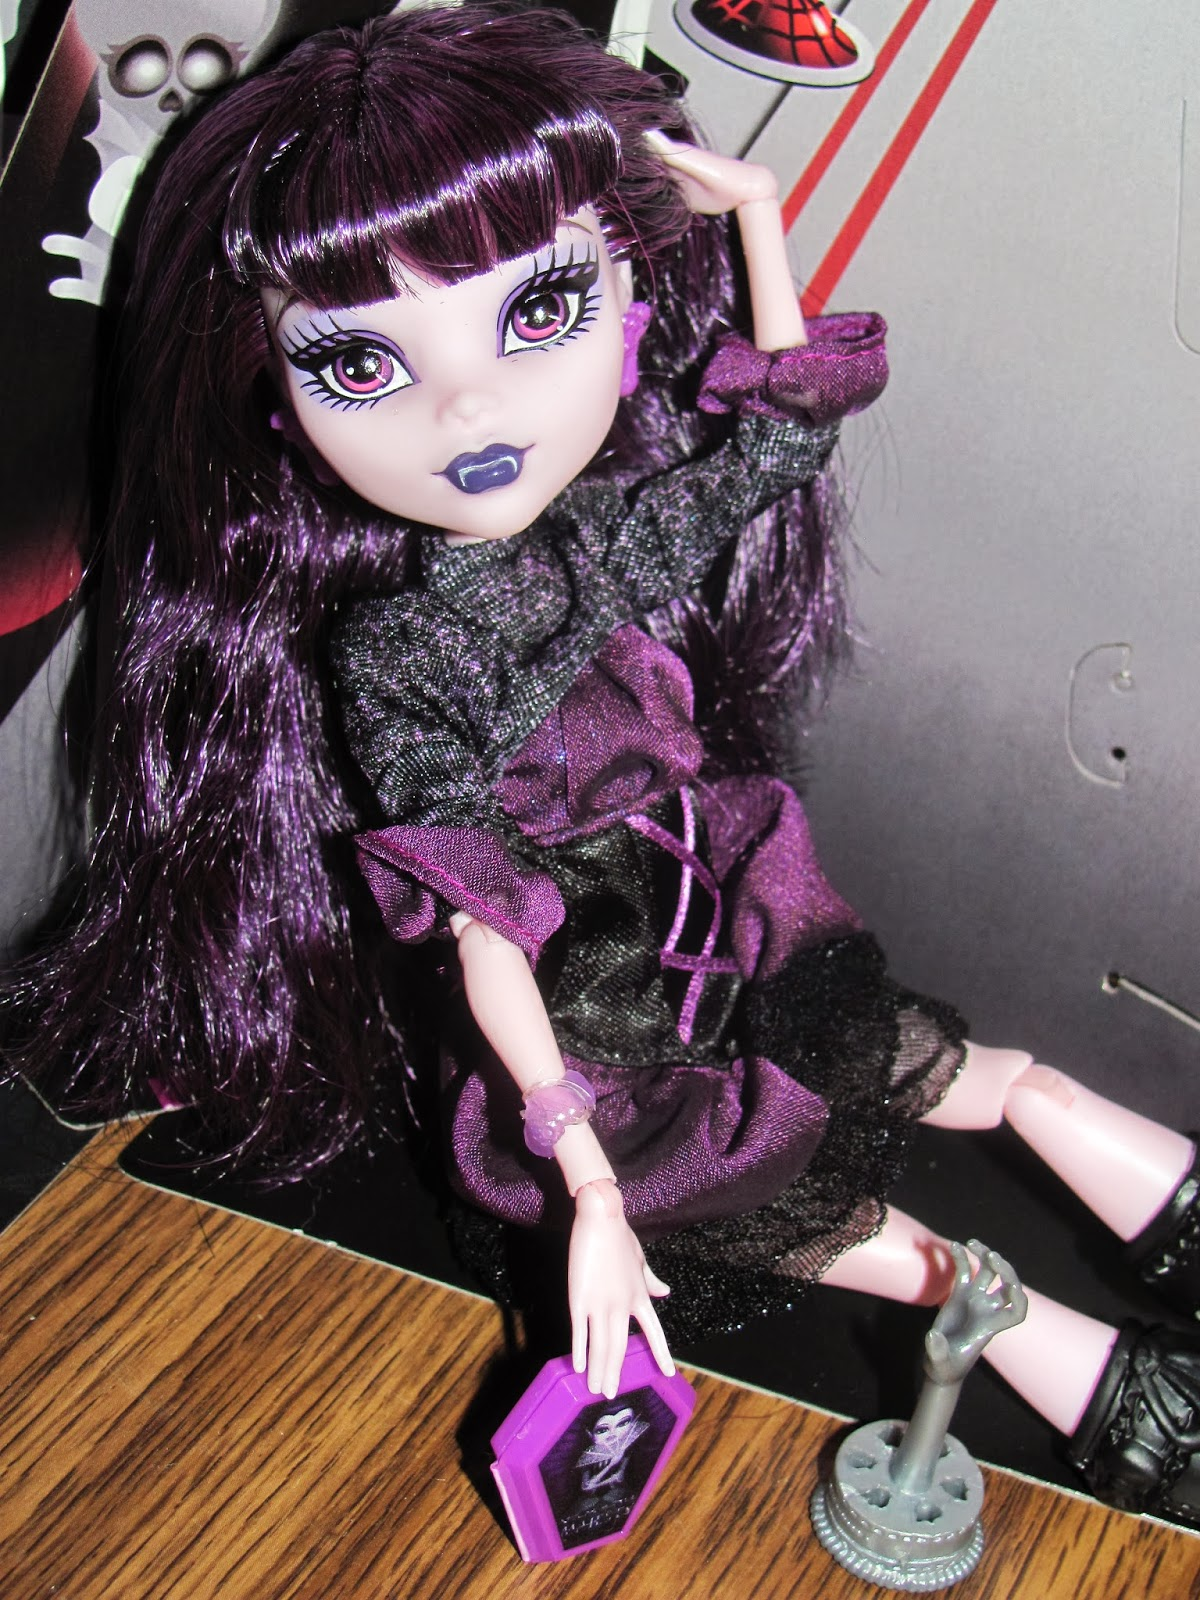 Monster High Doll Review-Elissabat Ghoul Fair - Isbah's Blog